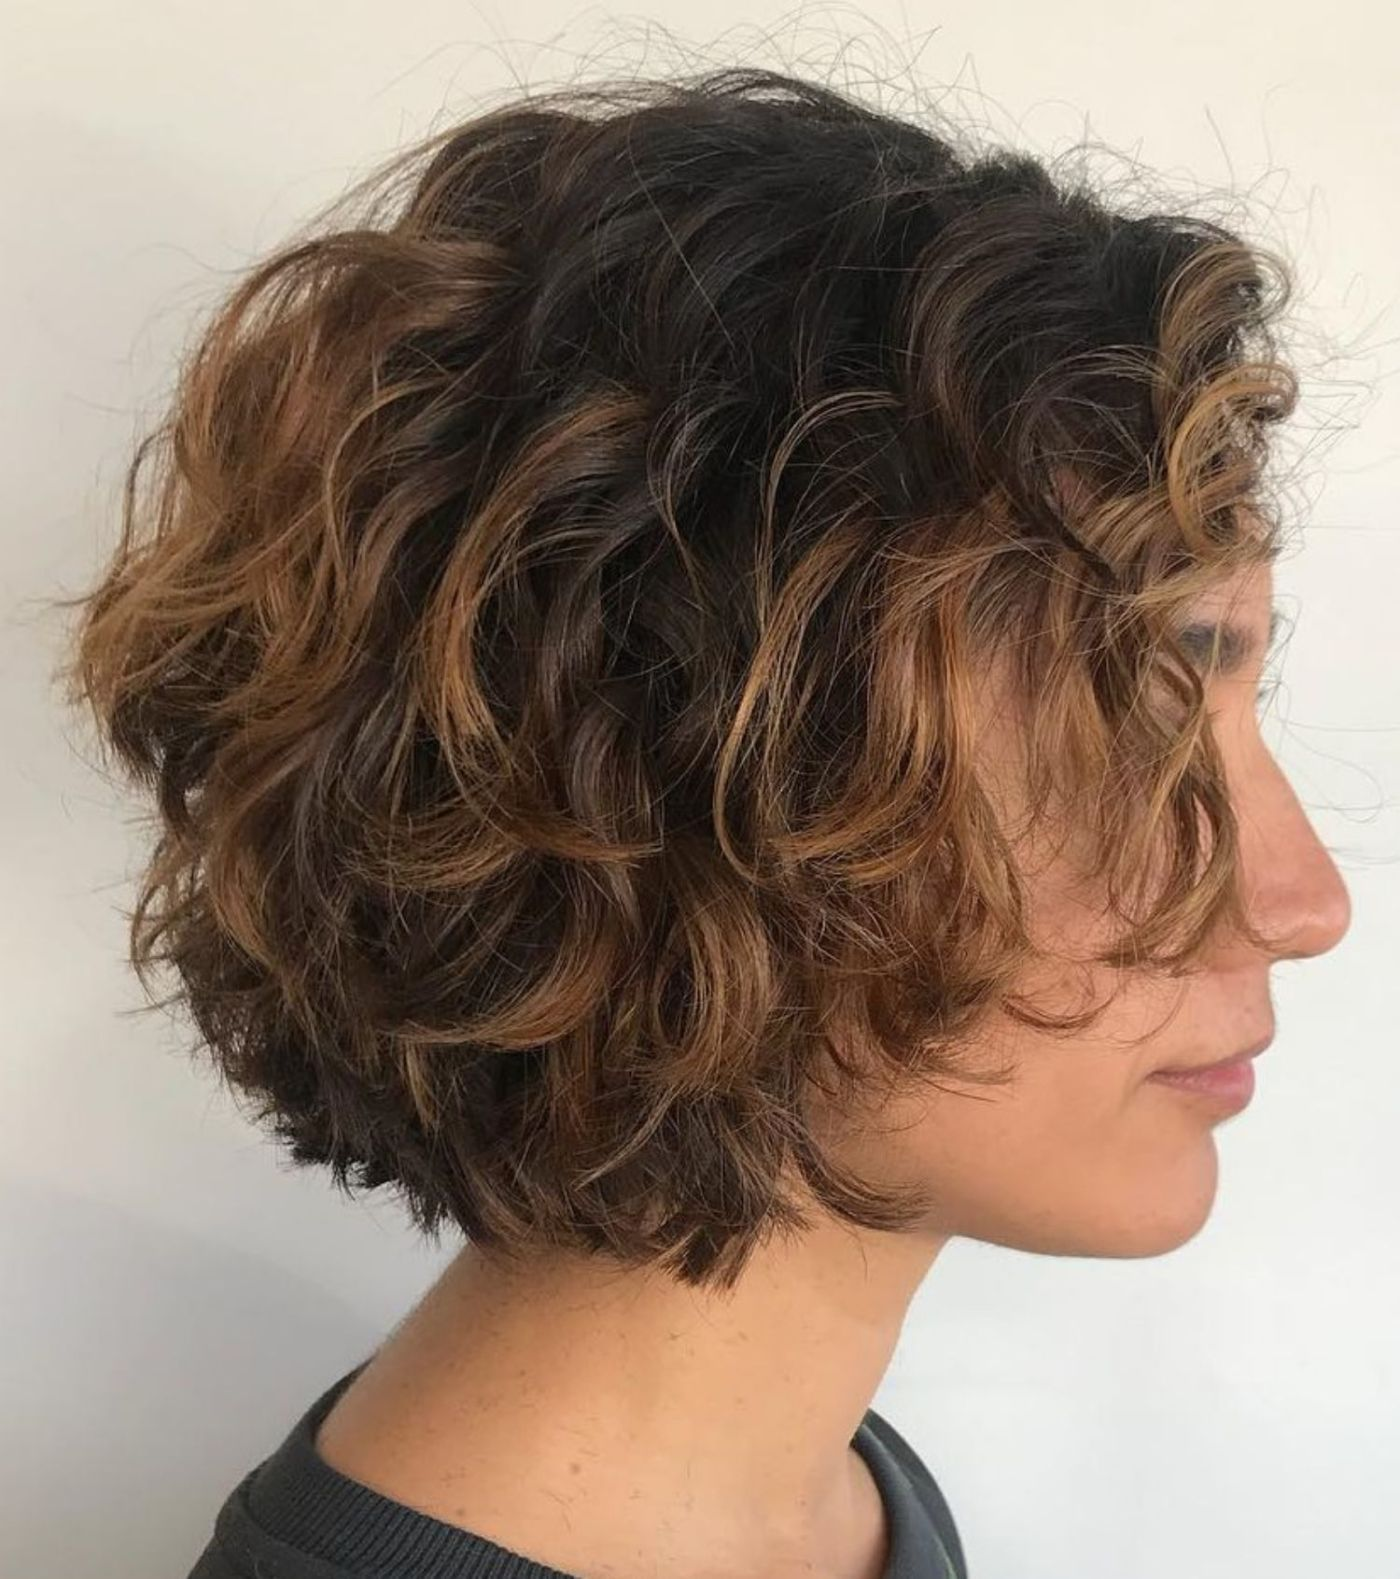 Short Textured Curly Bob Short Layered Curly Hair Short Wavy Hair Hair Styles